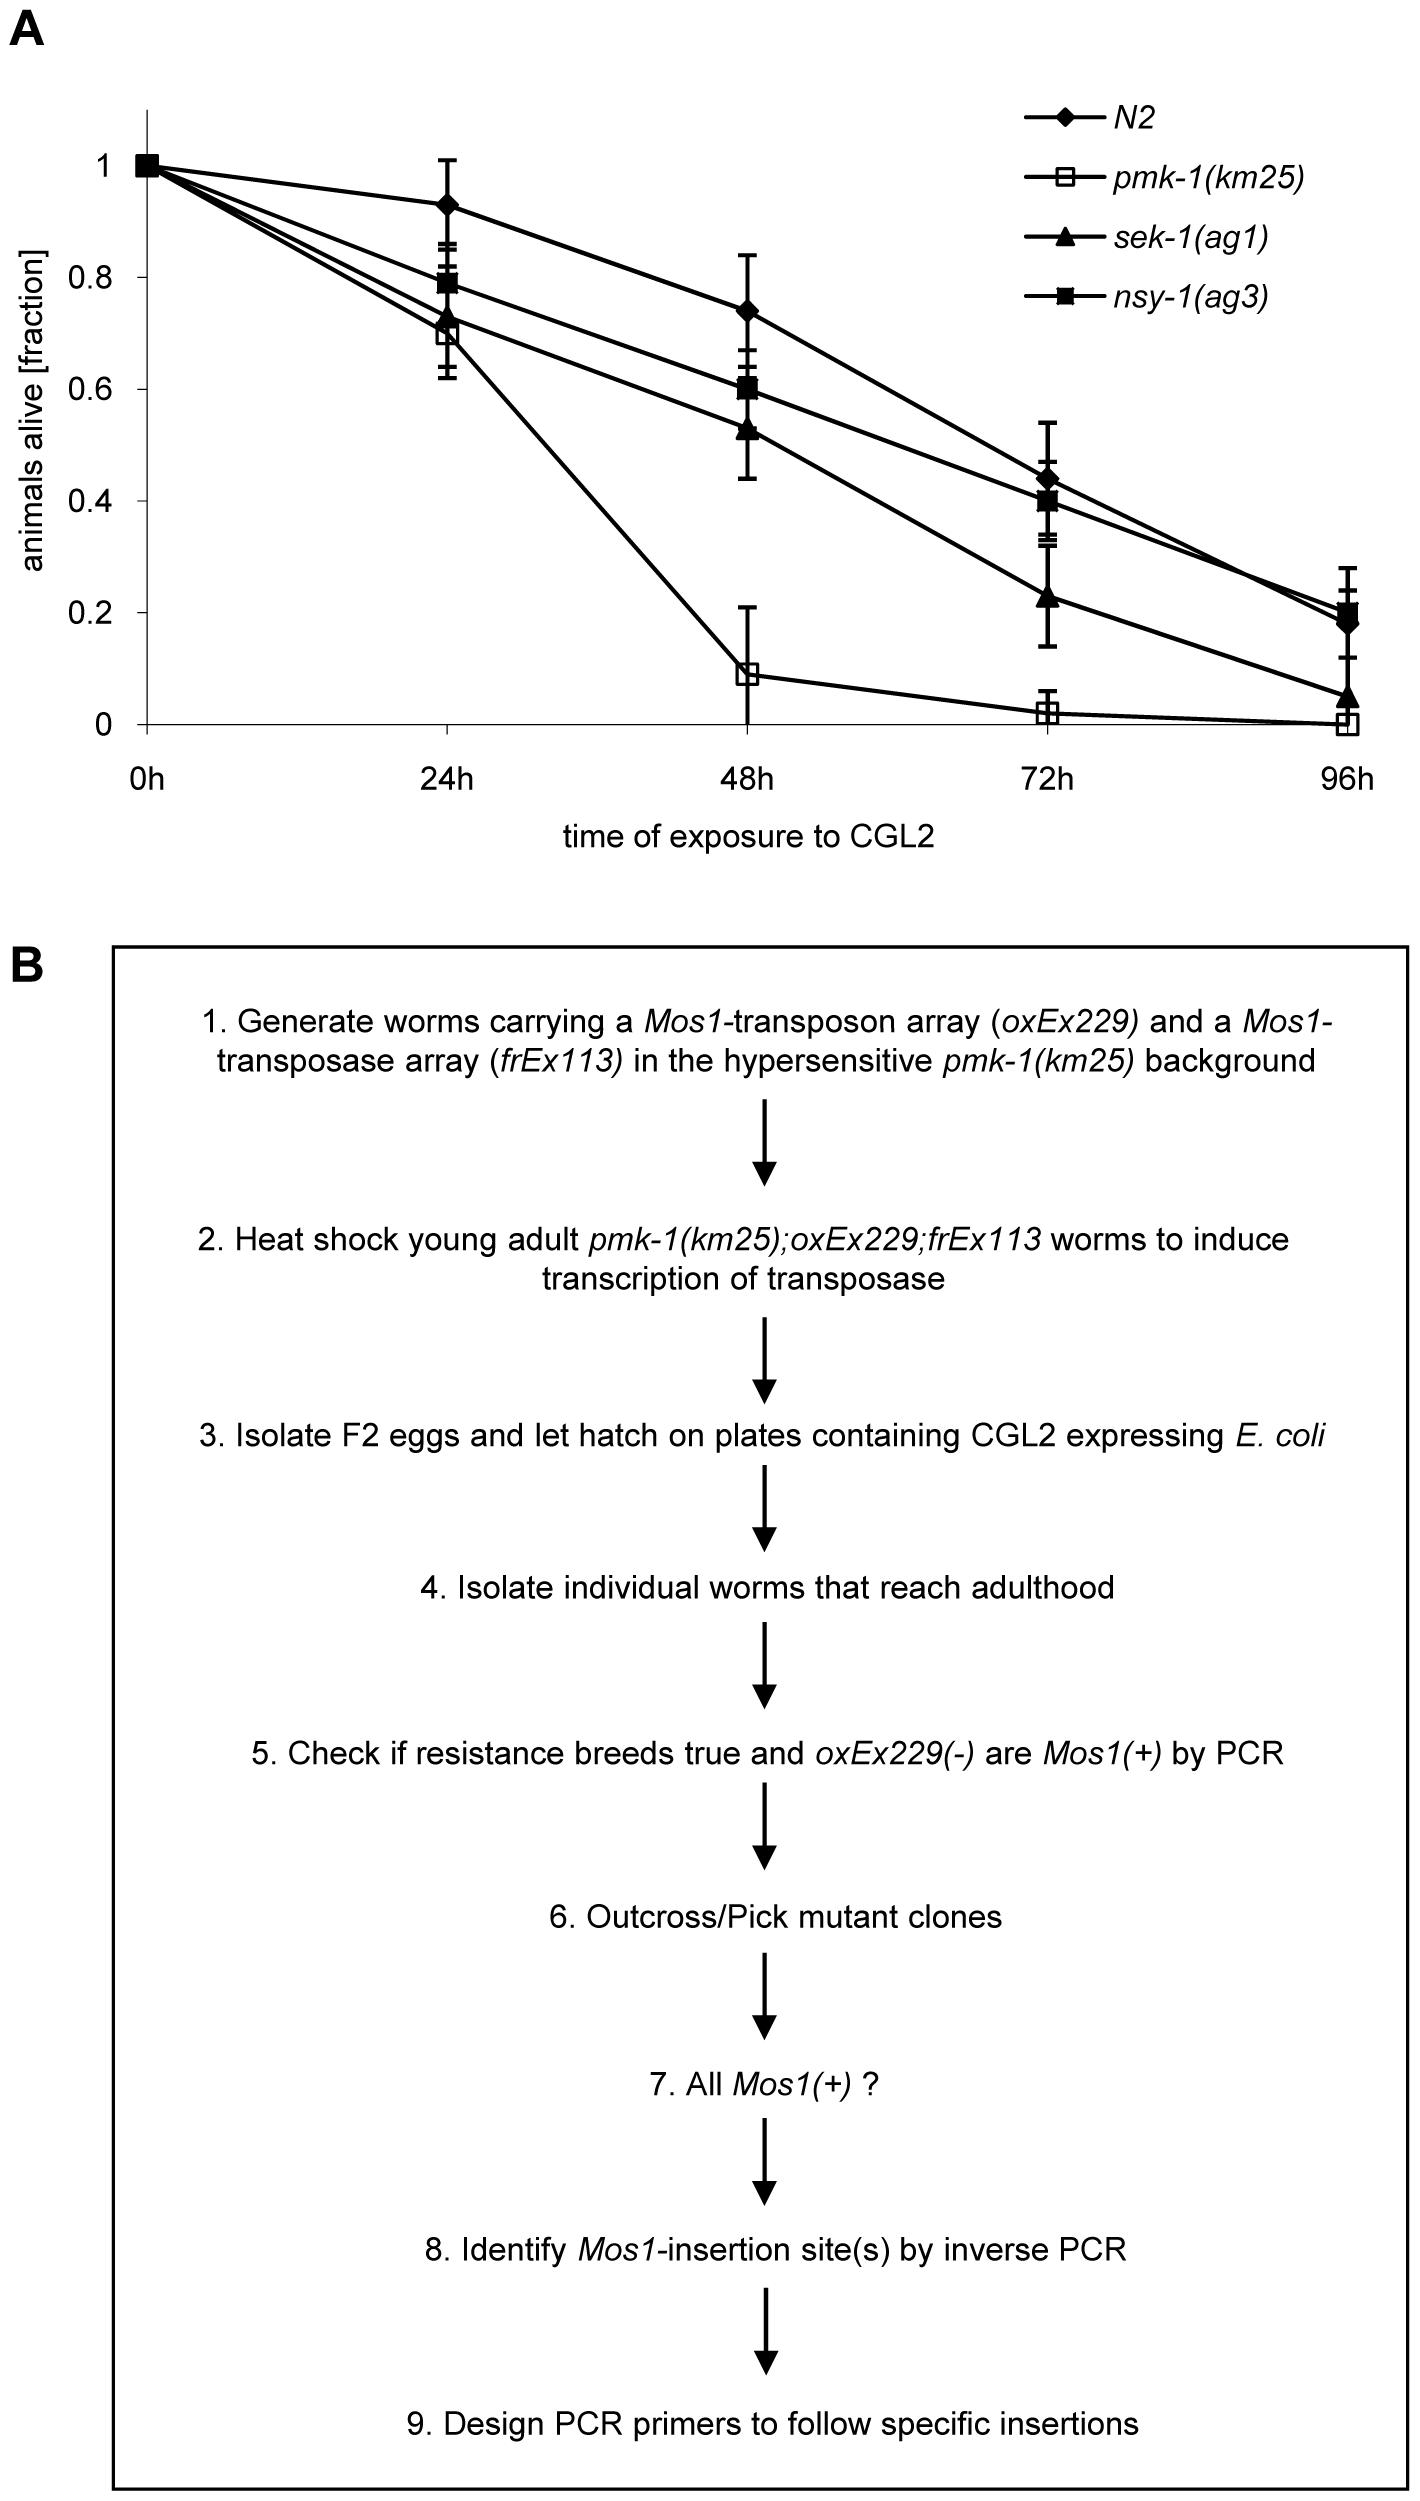 Workflow of the forward genetic screen for CGL2-resistant <i>C. elegans</i> mutants.